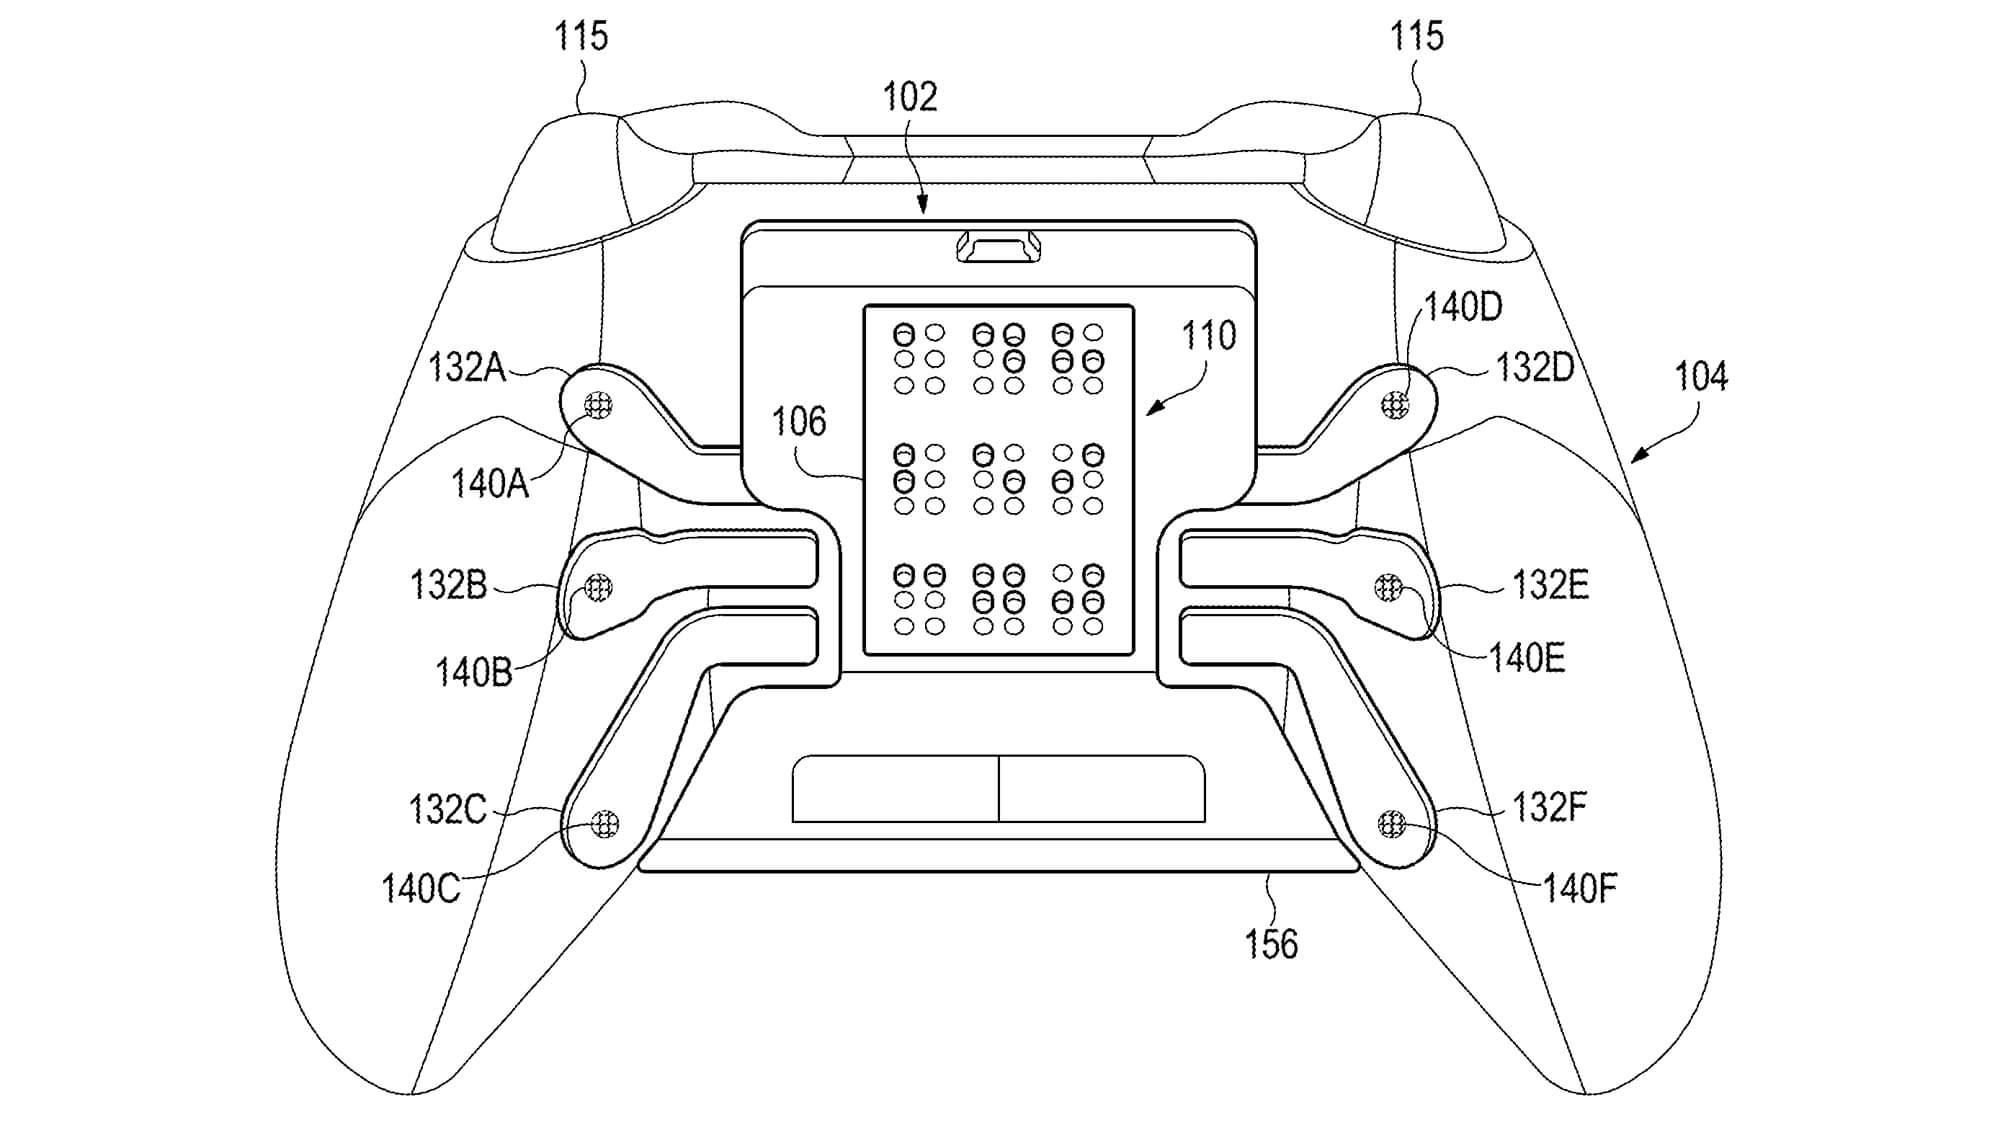 Microsoft Registra Patente De Joystick Para Deficientes